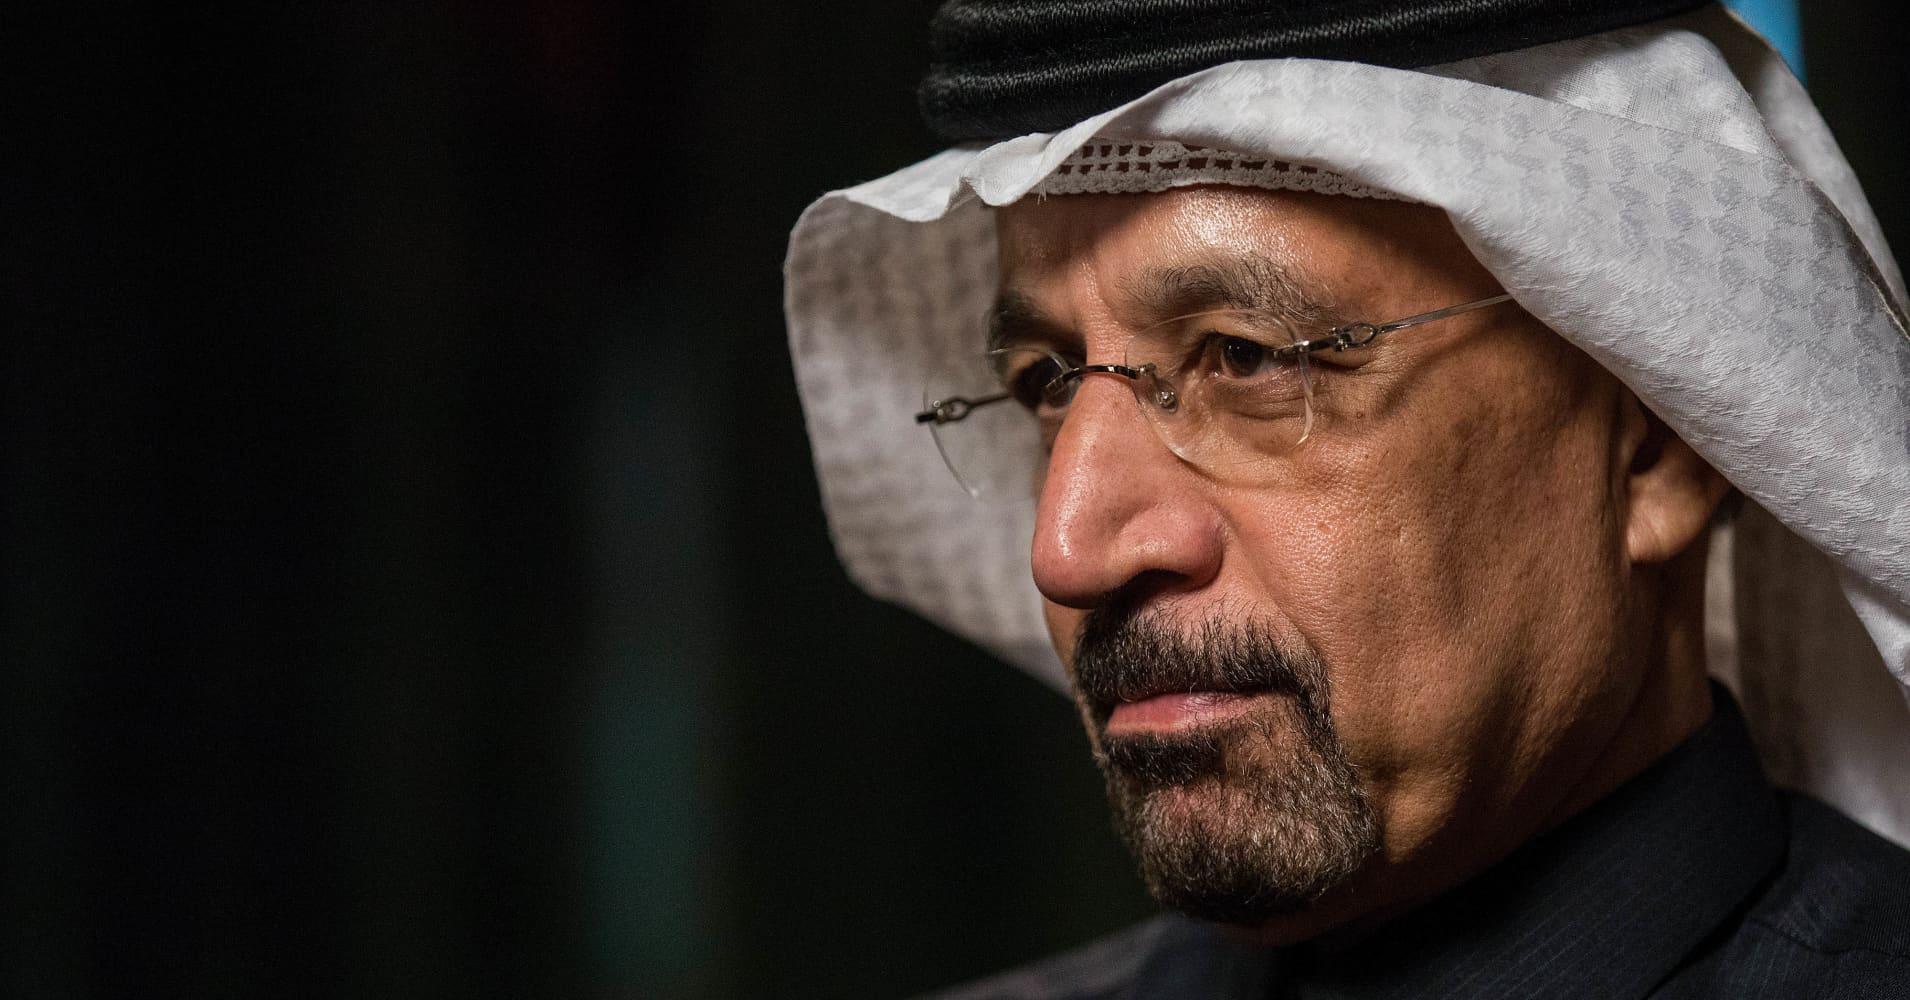 Saudi Arabia and Russia have a 'long-term relationship' despite output U-turn, Dan Yergin says